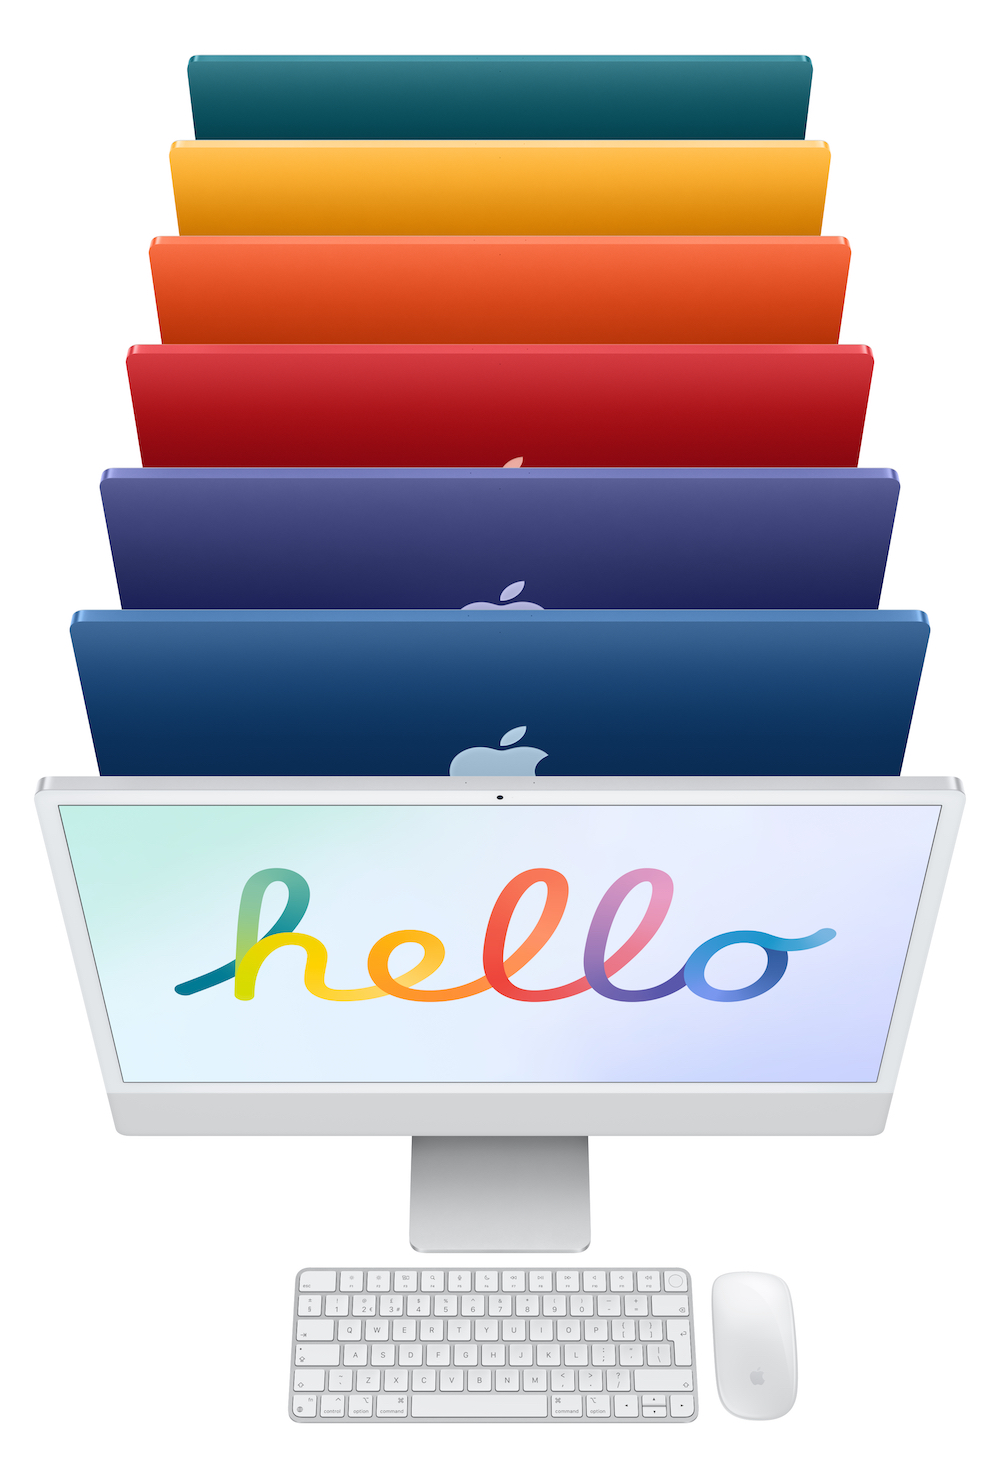 iMac_24-in_M1_chip_Hero_Vertical_Screen__GBEN